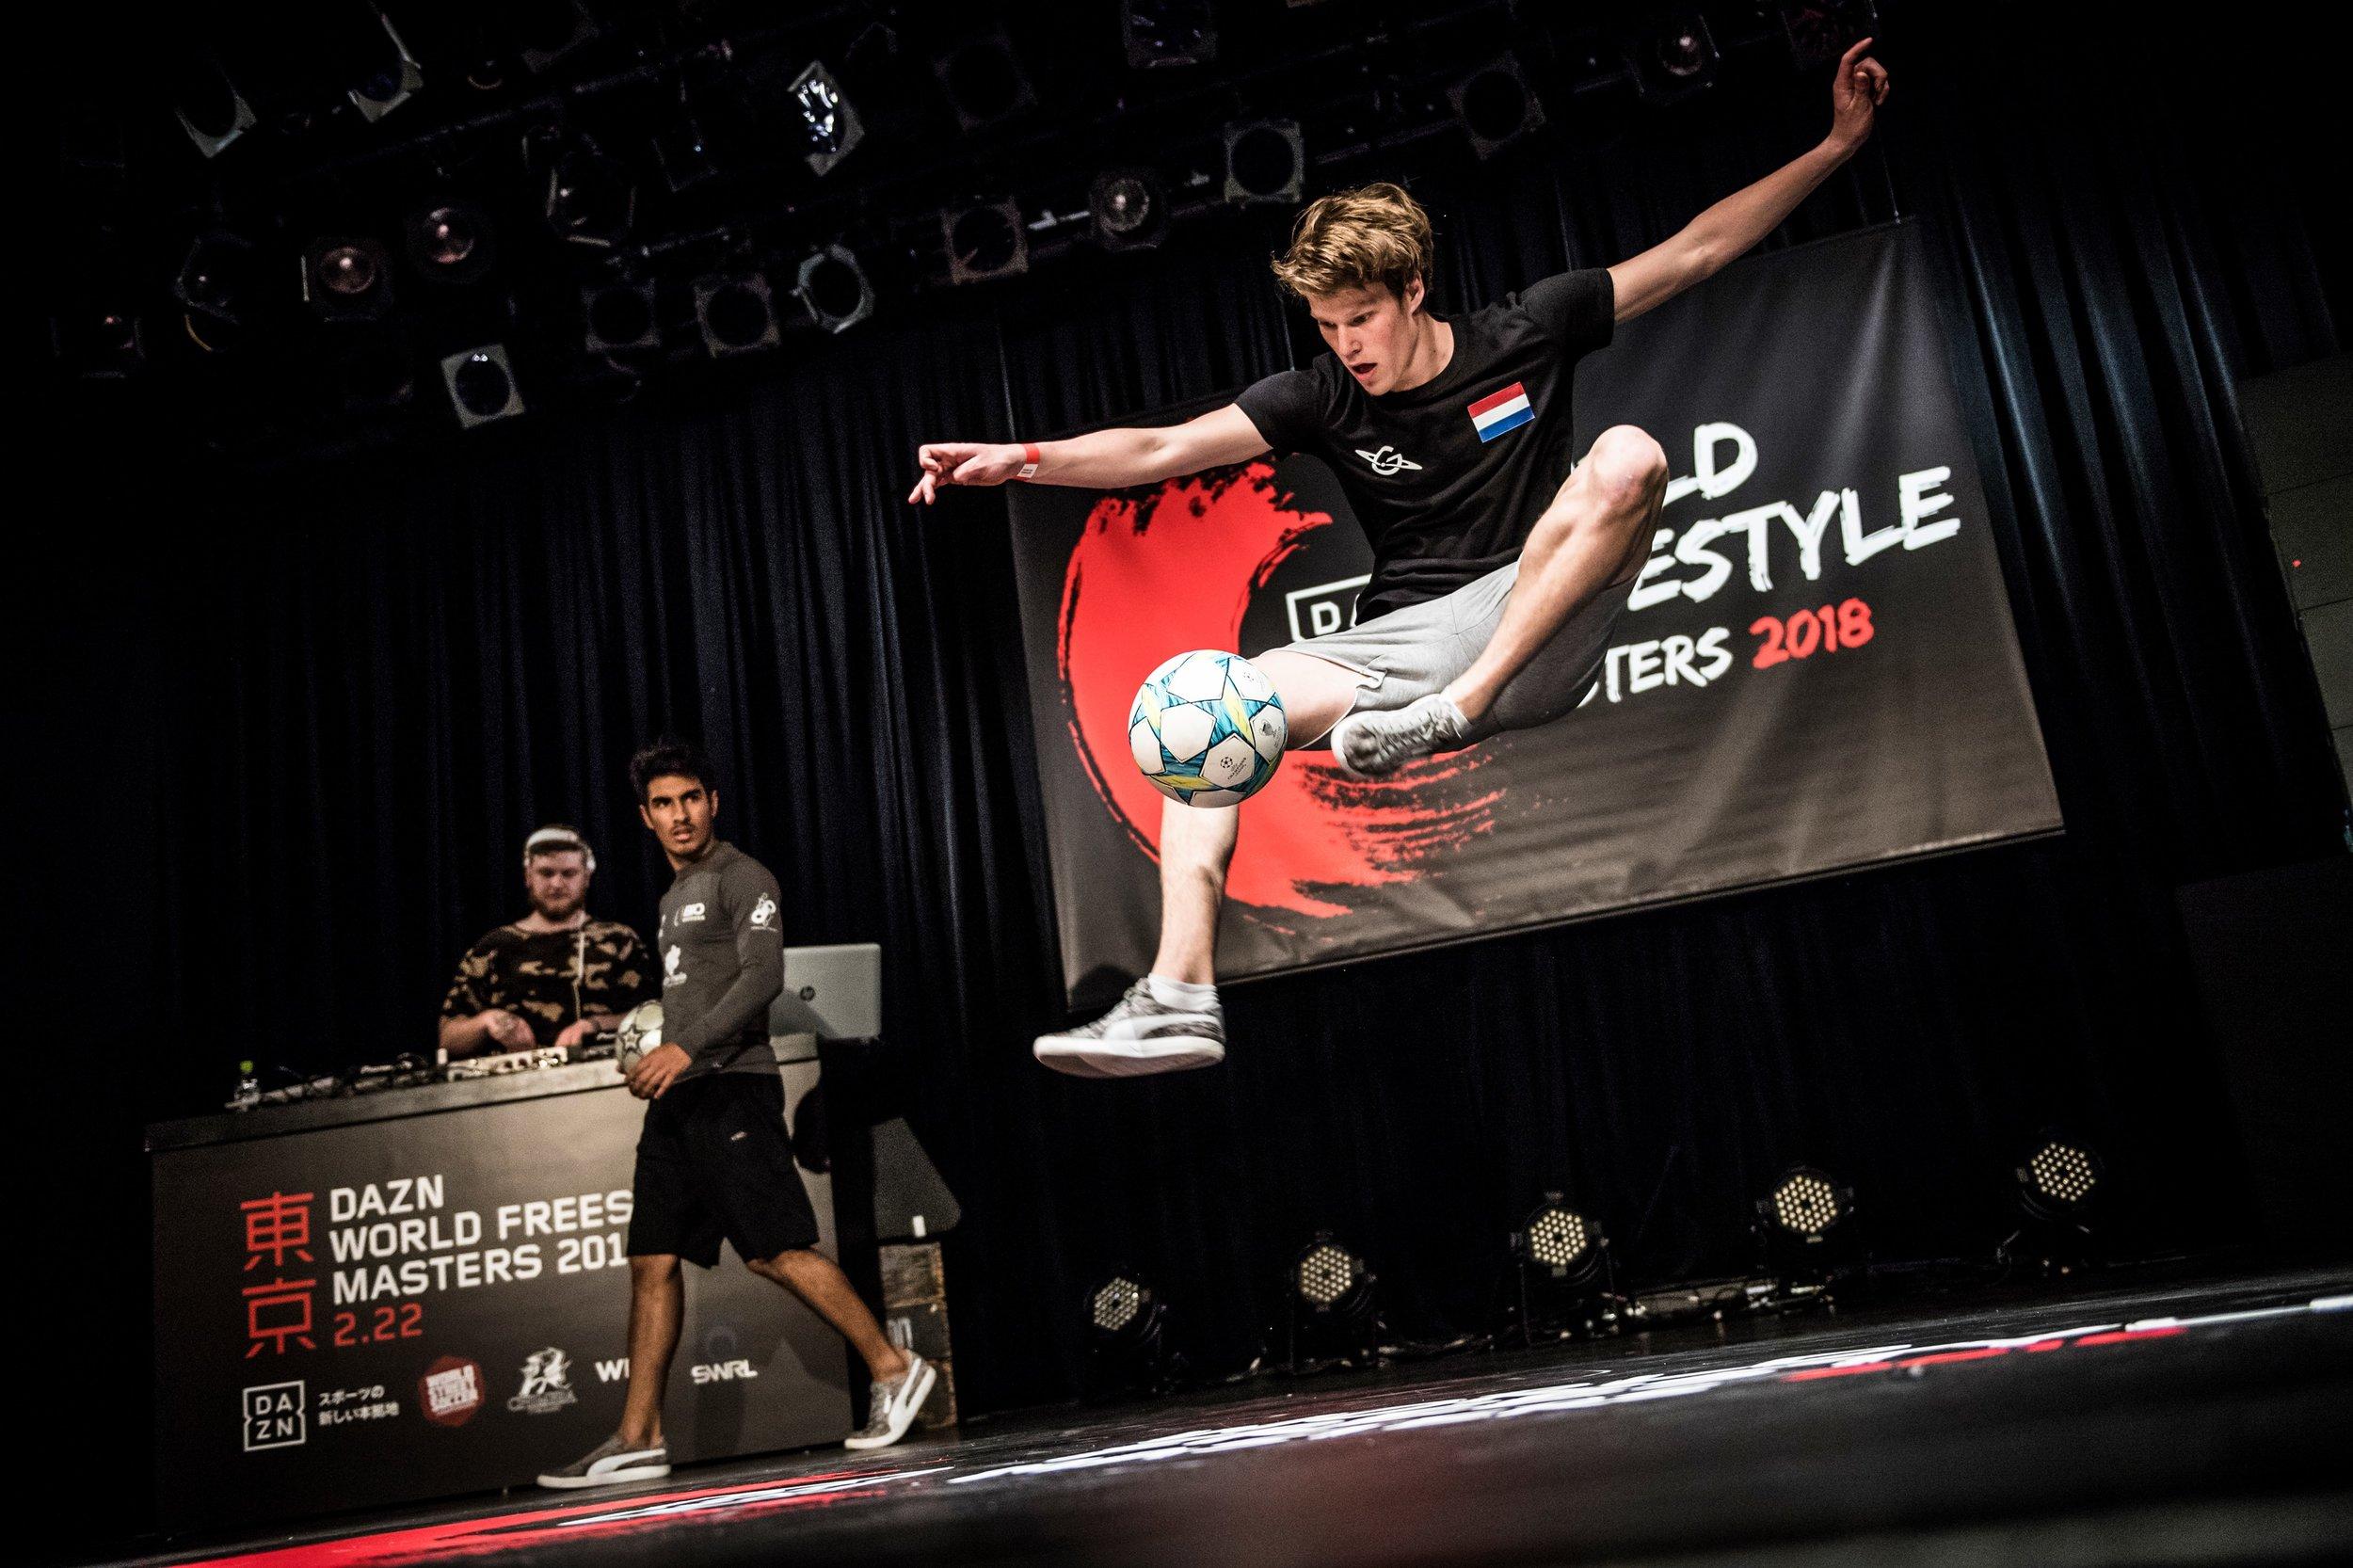 World Freestyle Masters - Top 16 van het WK in Tokyo Jesse Marlet